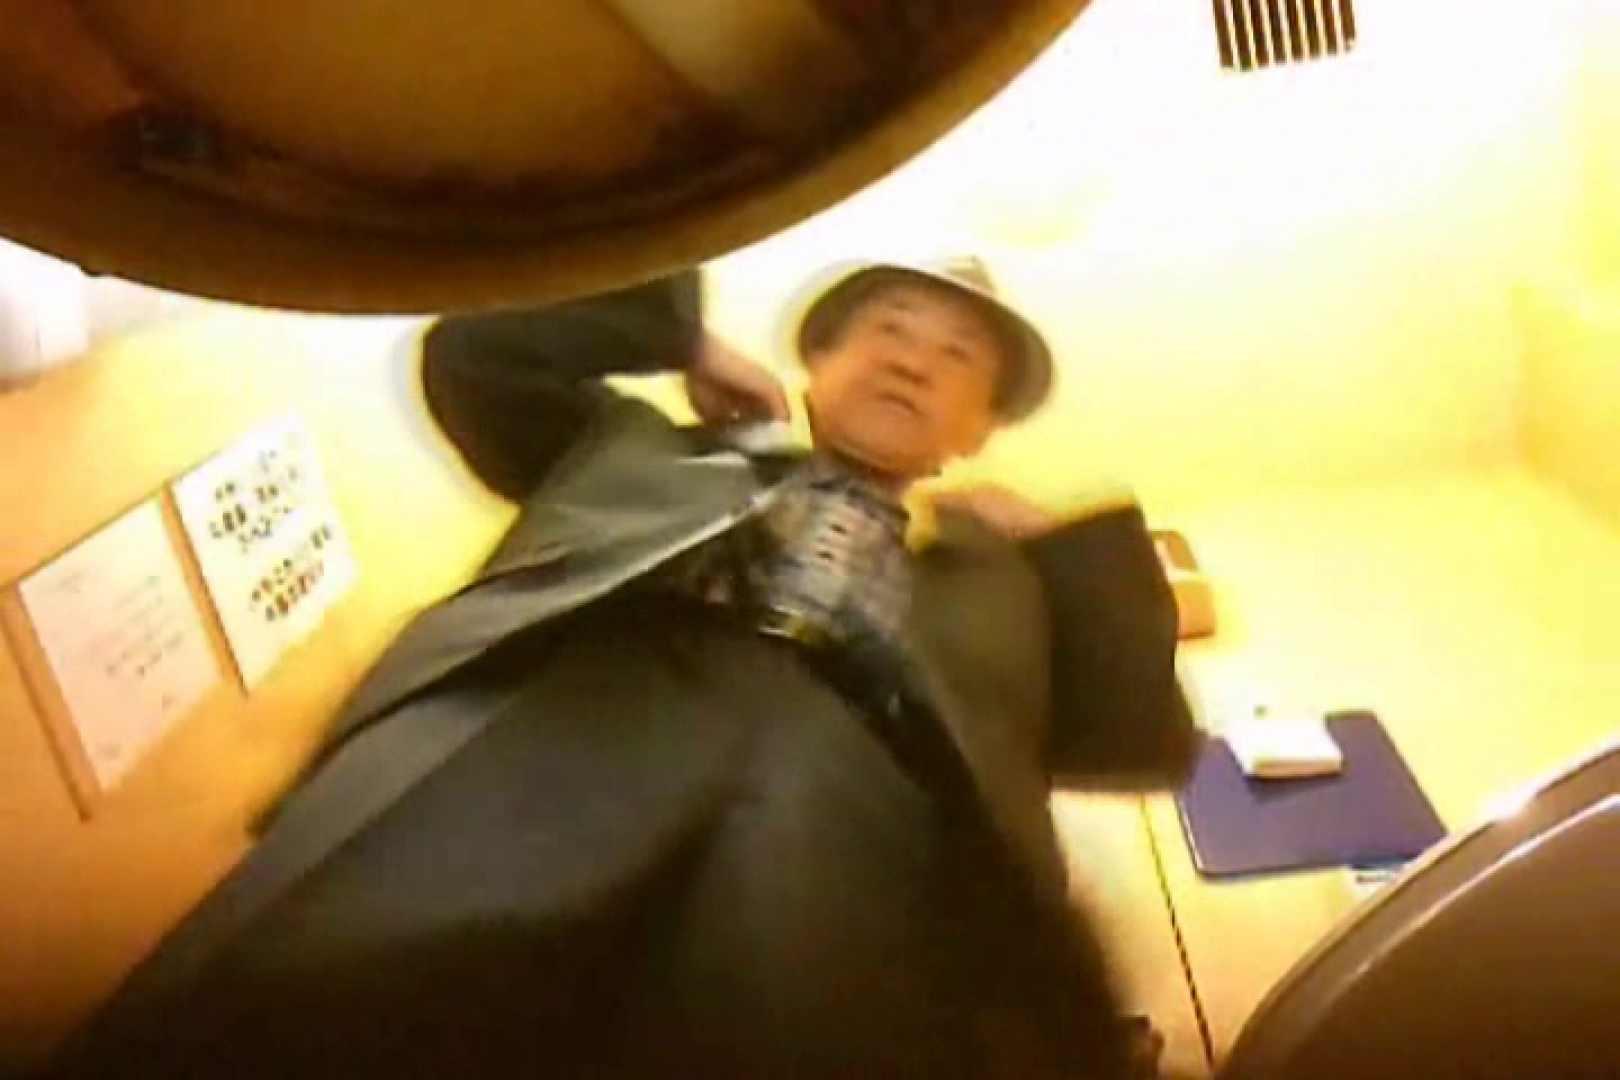 SEASON 3rd!掴み取りさんの洗面所覗き!in新幹線!VOL.09 覗きお宝 ゲイアダルトビデオ画像 71連発 19